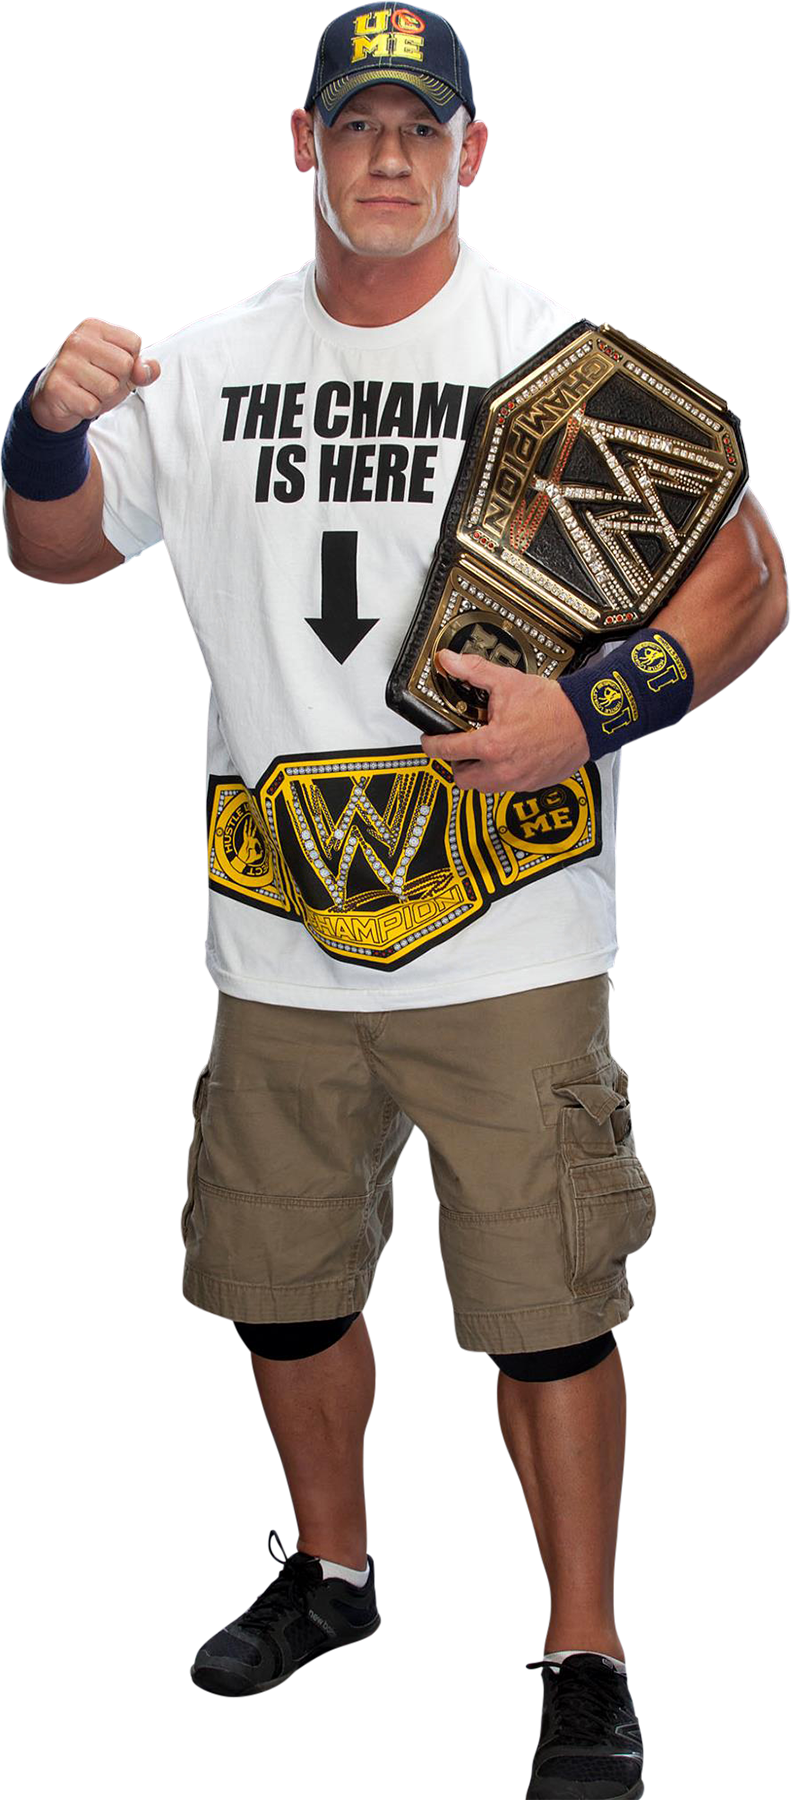 John Cena WWE CHAMPION 2013 by SantiagoWWE12 on DeviantArtJohn Cena Wwe Champion 2013 Champ Is Here